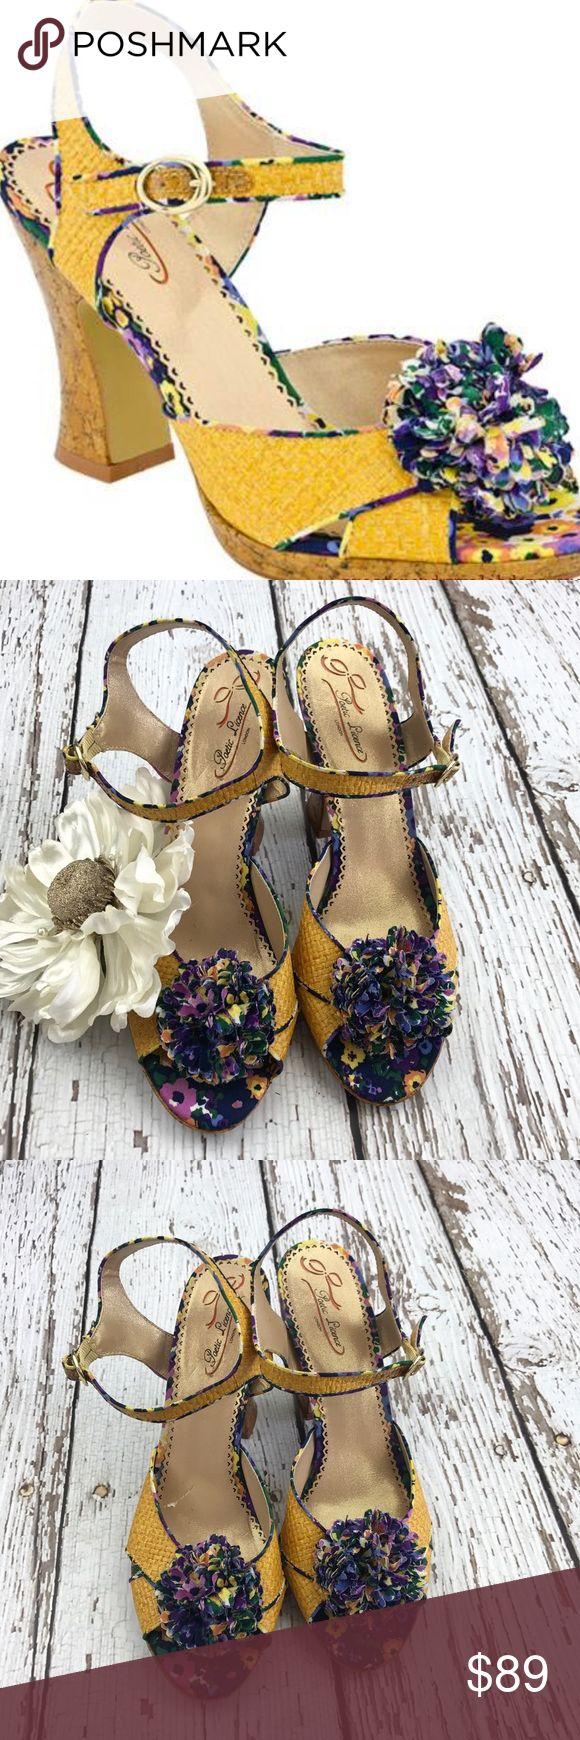 "💕SALE💕Poetic Licence Yellow Dress Italian Sandal Gorgeous 💕Poetic Licence Yellow Dress Italian Sandals 3 1/2"" Heel Poetic License Shoes Sandals"